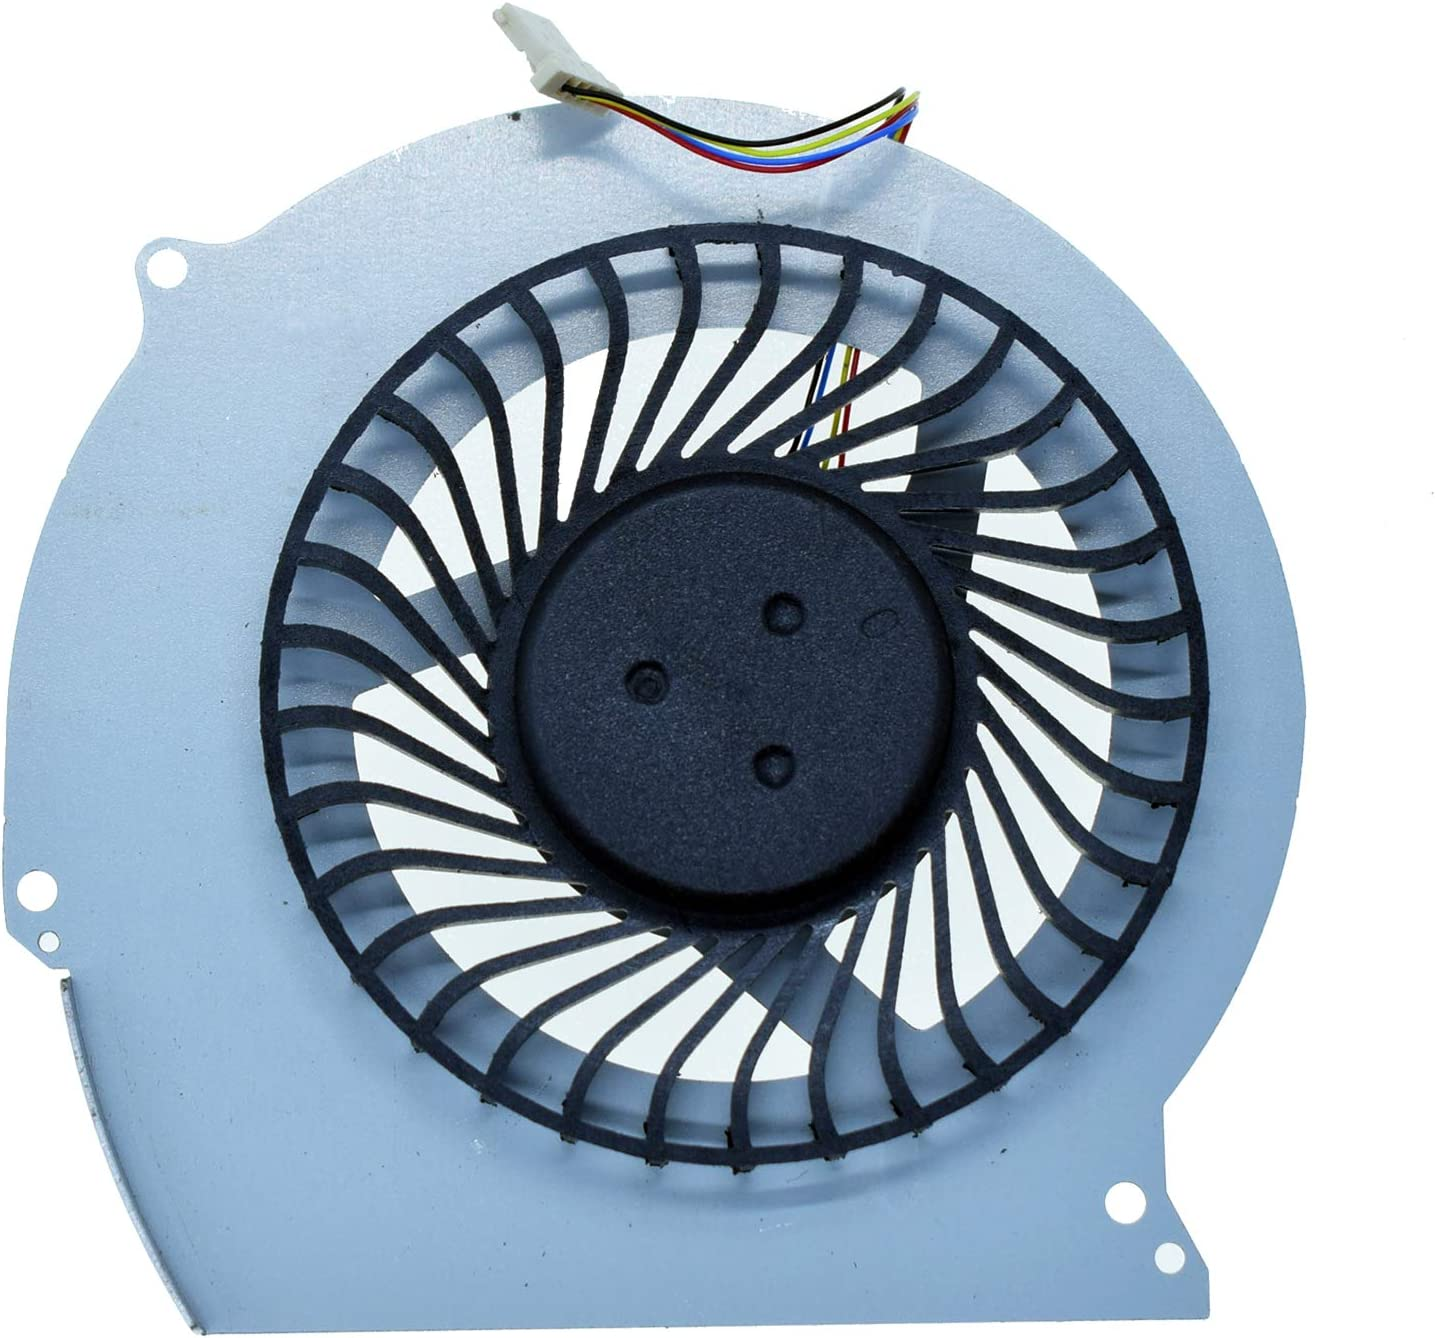 DREZUR GPU Cooling Fan Compatible for Dell Inspiron 15 7566 7567 14-7466 7467 Series Laptop Cooler 0NWW0W (GPU Fan)